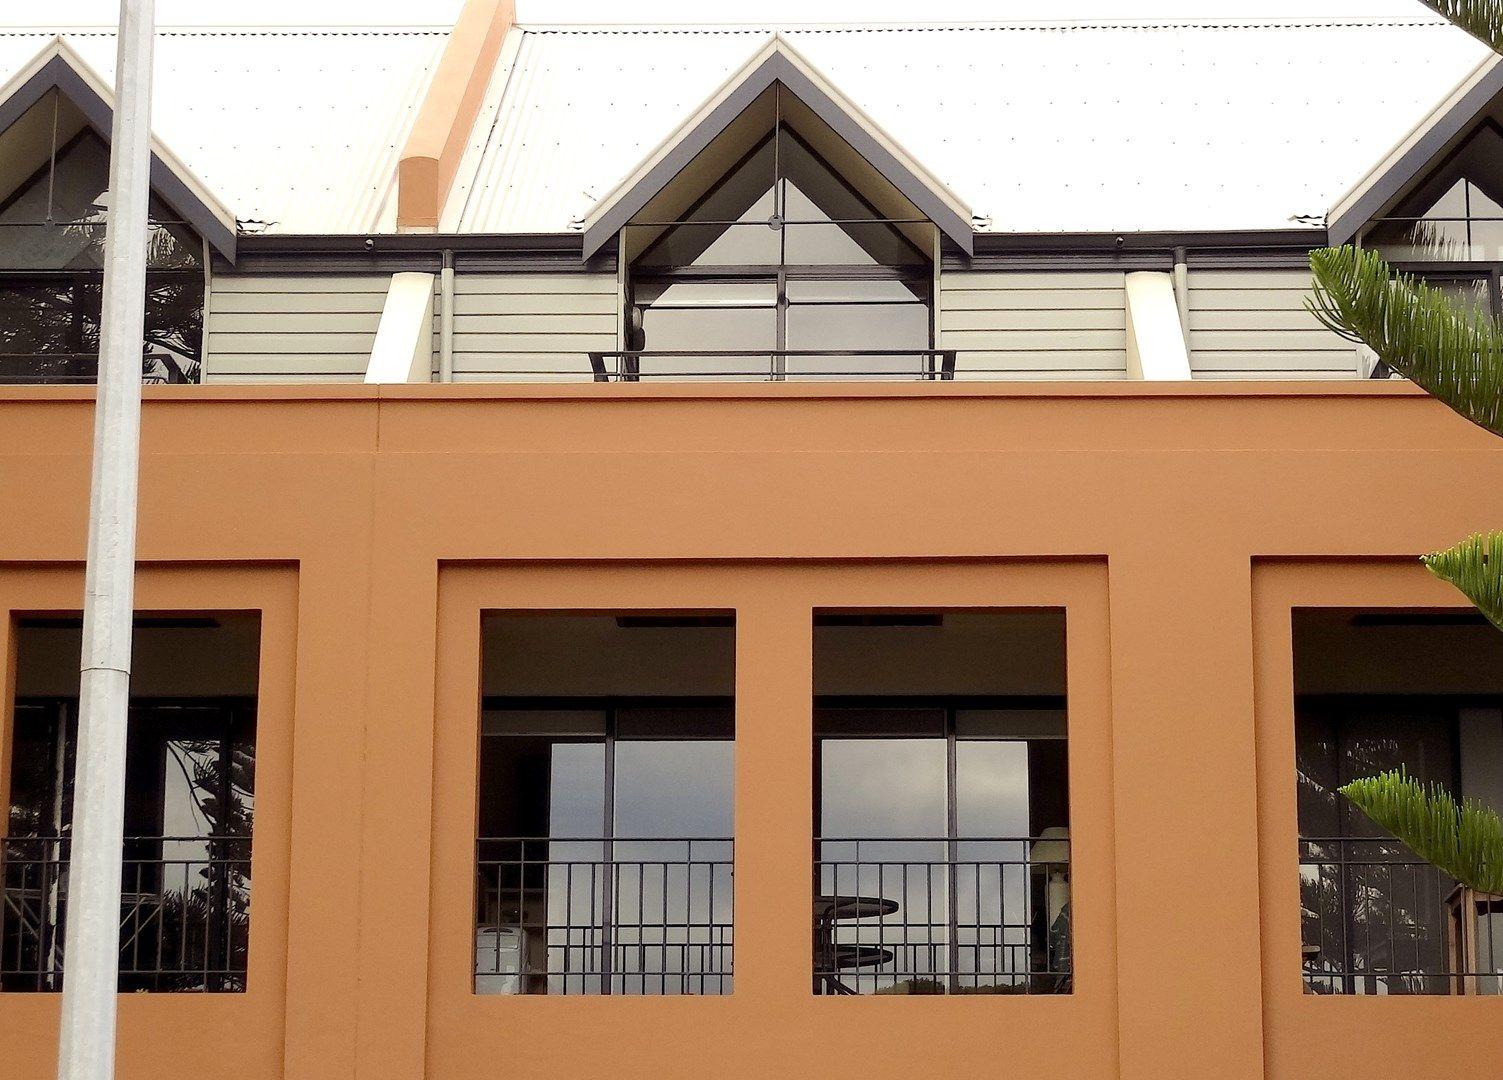 14/1 Norfolk Street, Fremantle WA 6160, Image 0